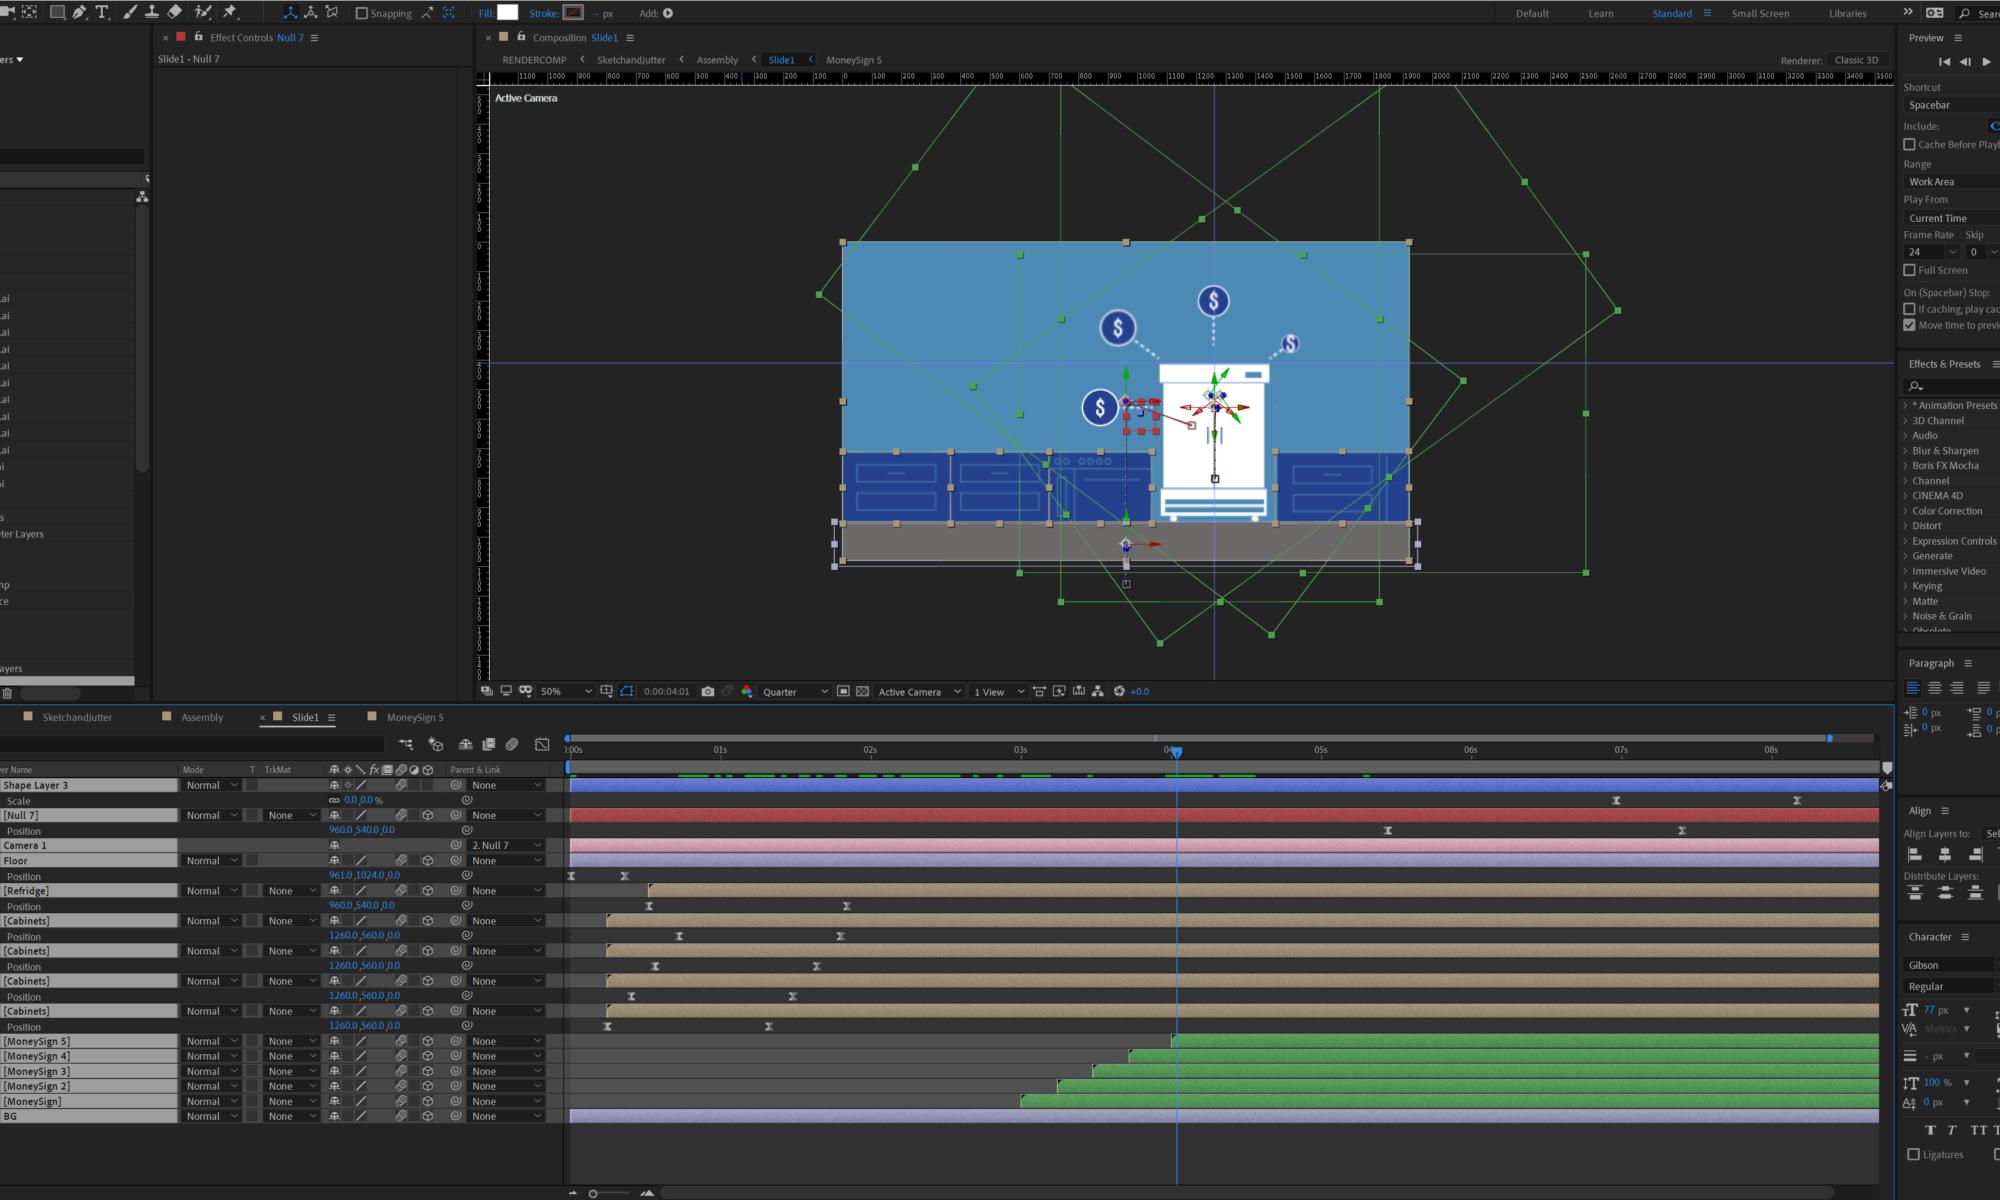 Animation In Progress